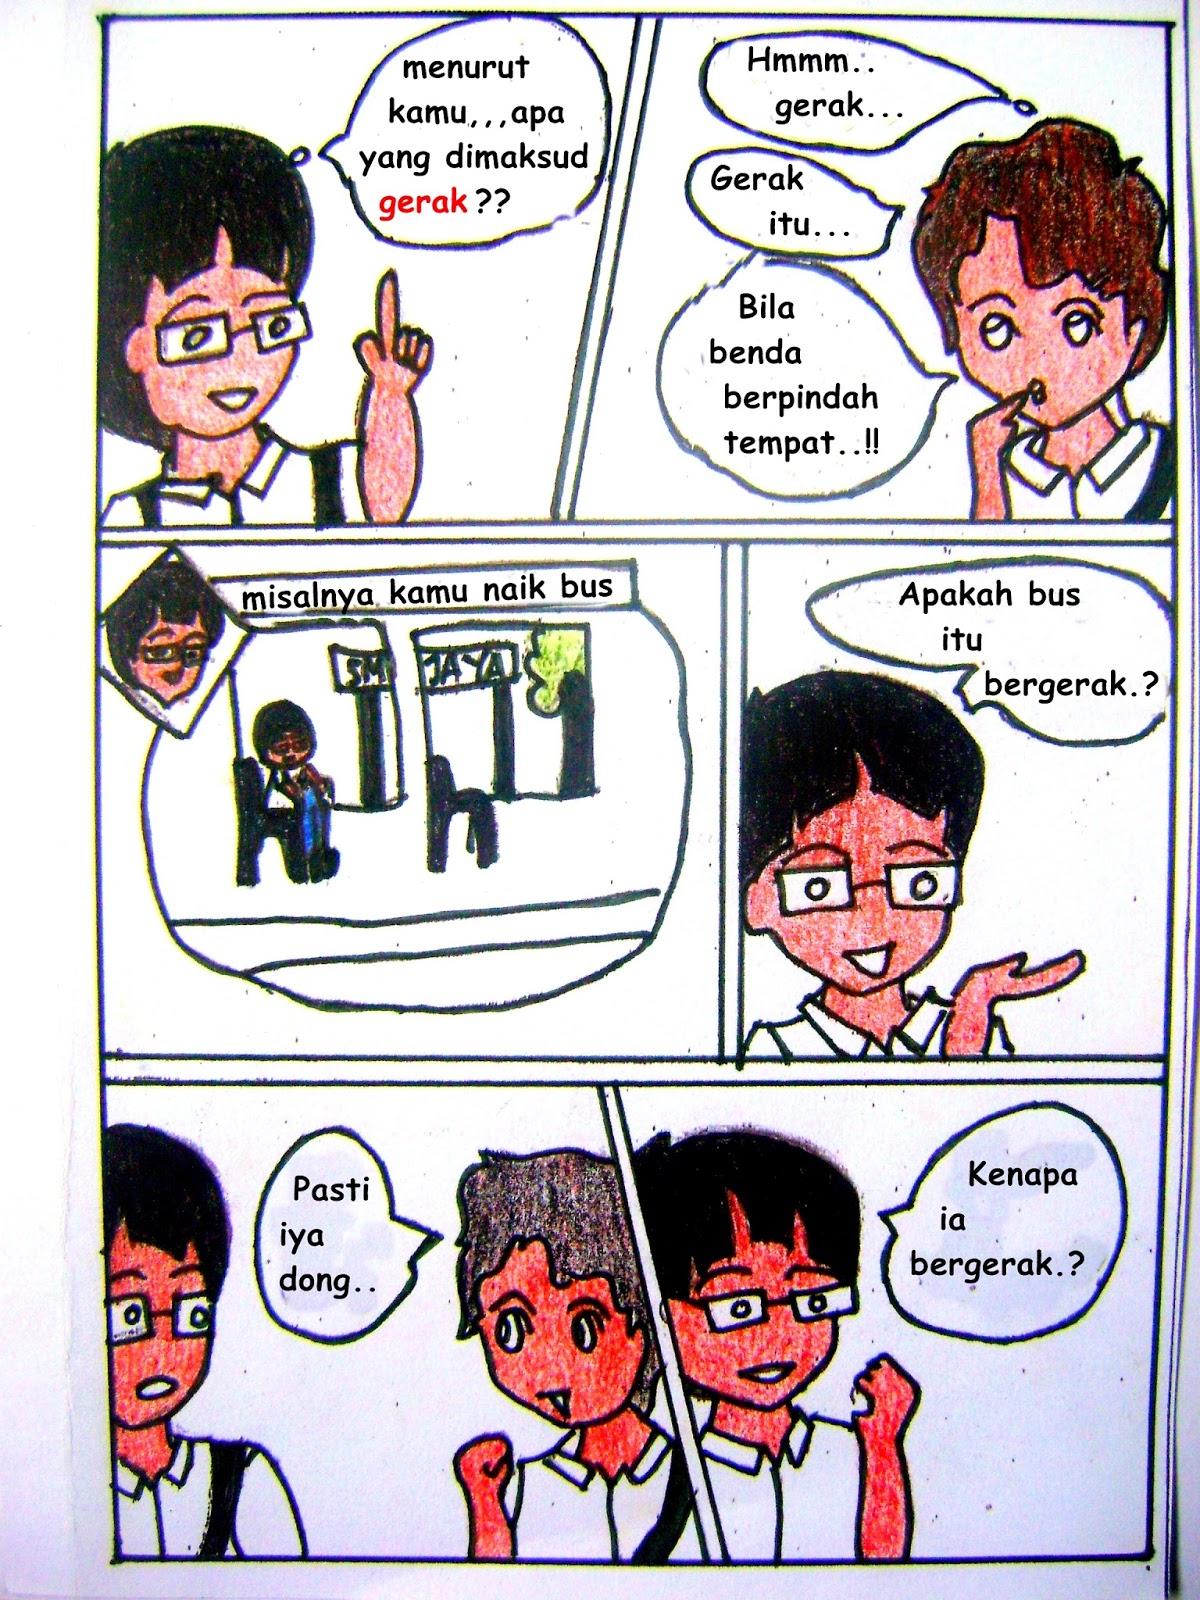 Komik Pendek Pendidikan : komik, pendek, pendidikan, Gambar, Komik, Pendidikan, Mudah